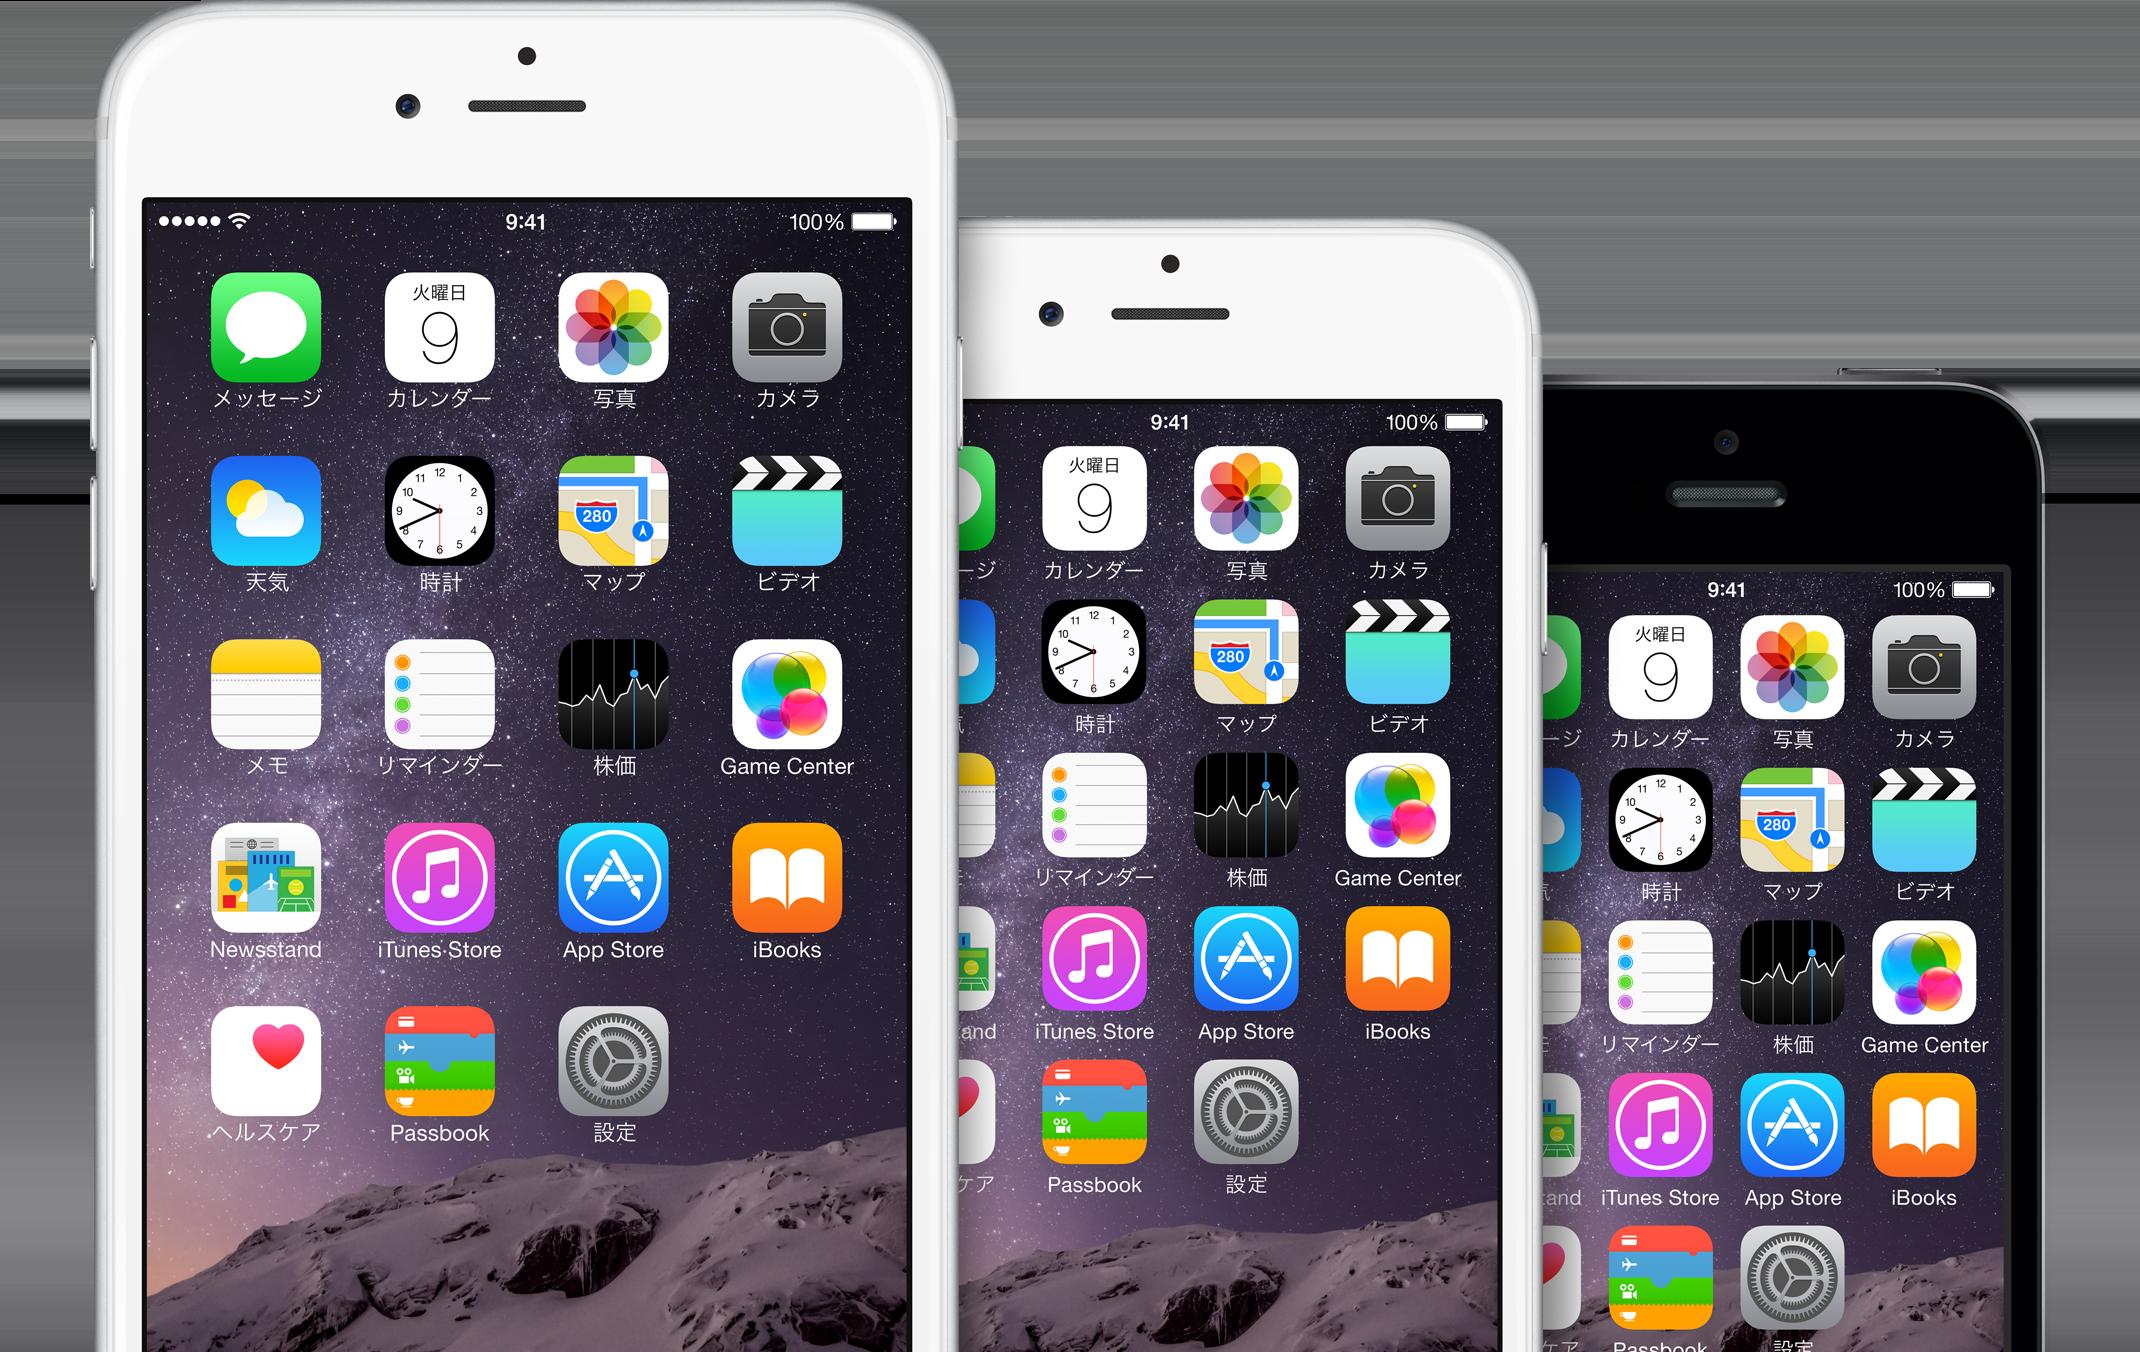 iPhone6 Plus SIMフリー版予約しちゃった